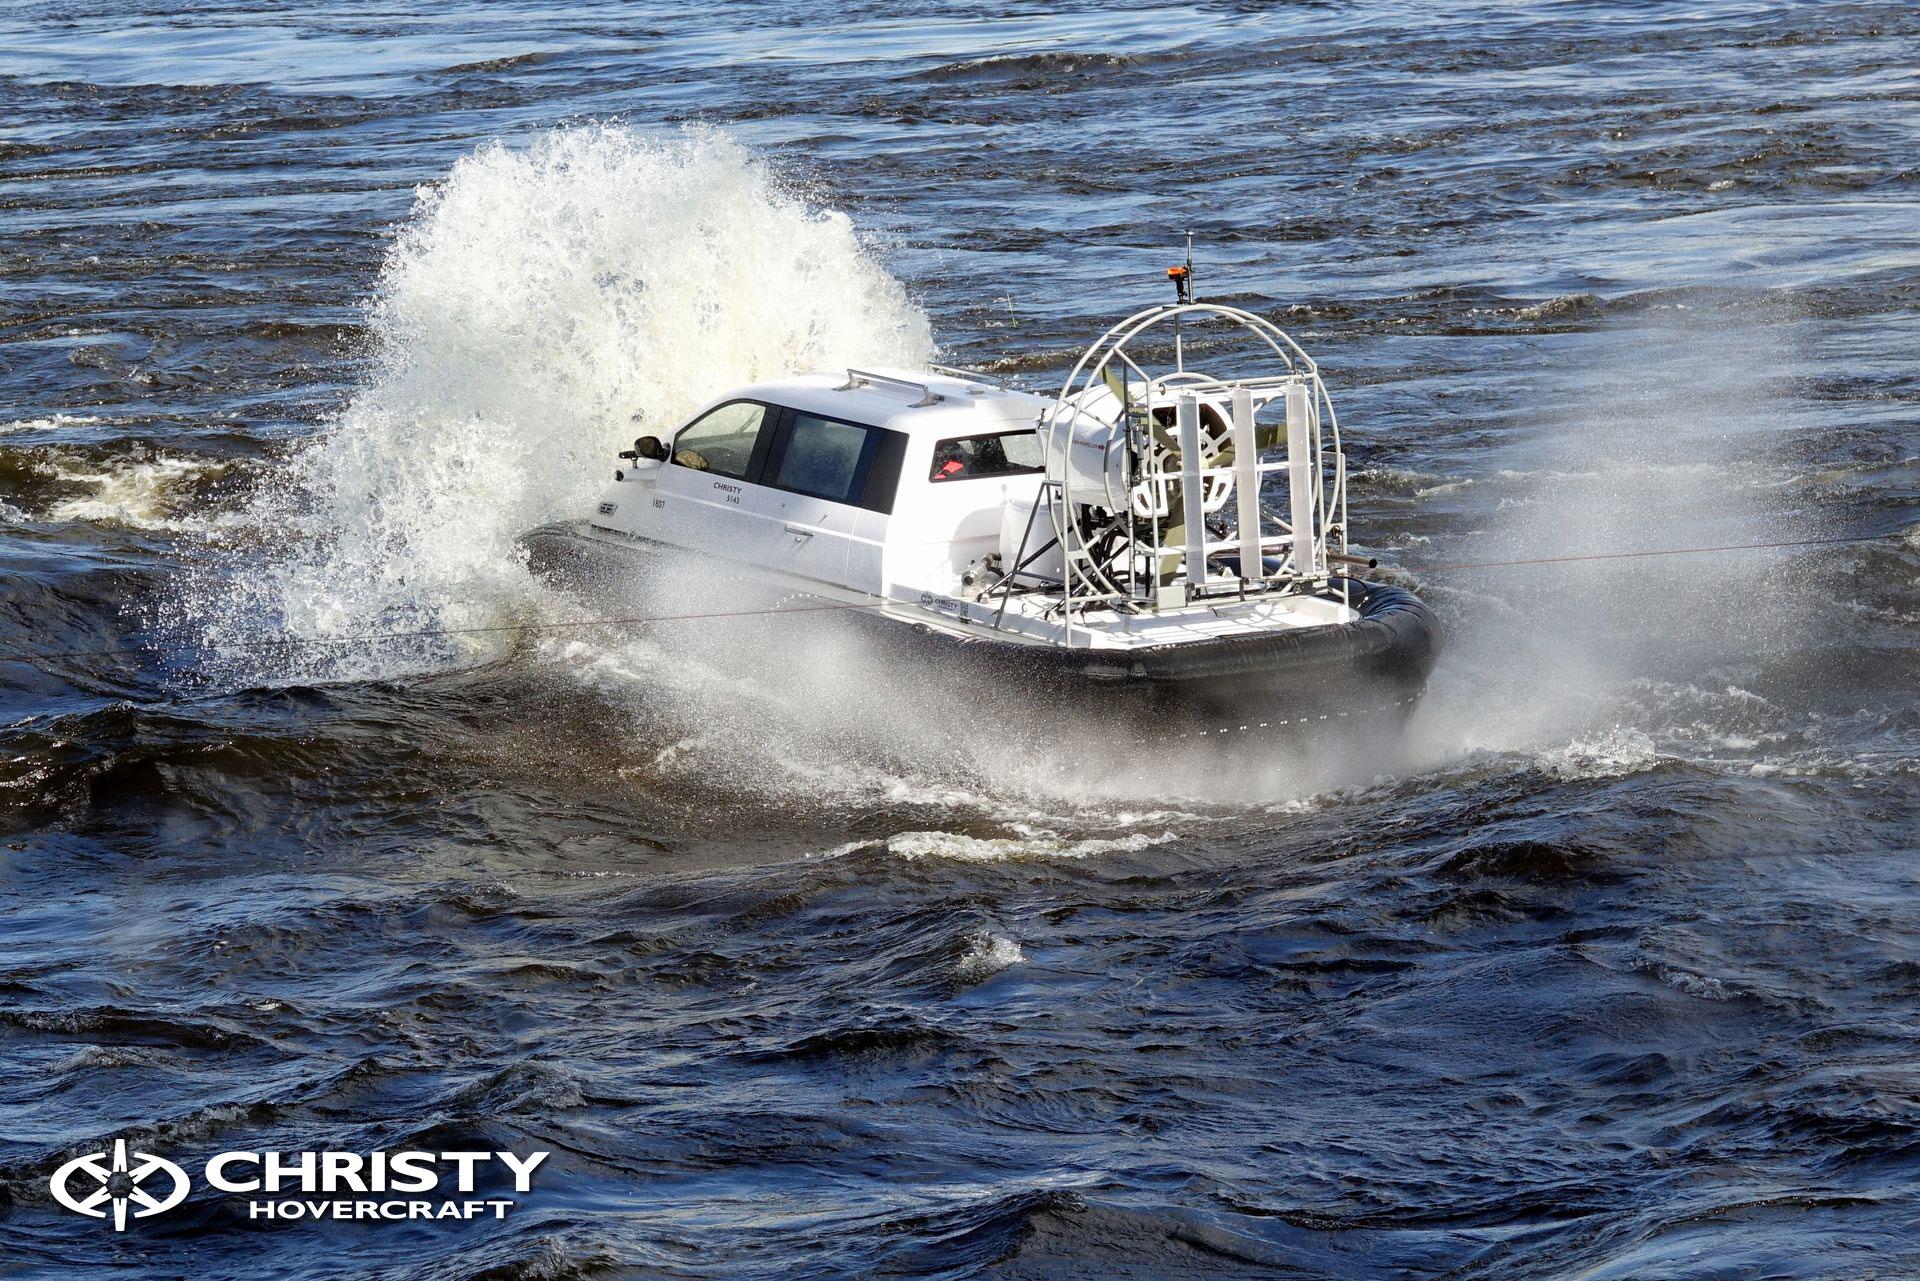 Hovercraft-Christy-5146-FC-06.jpg | фото №9